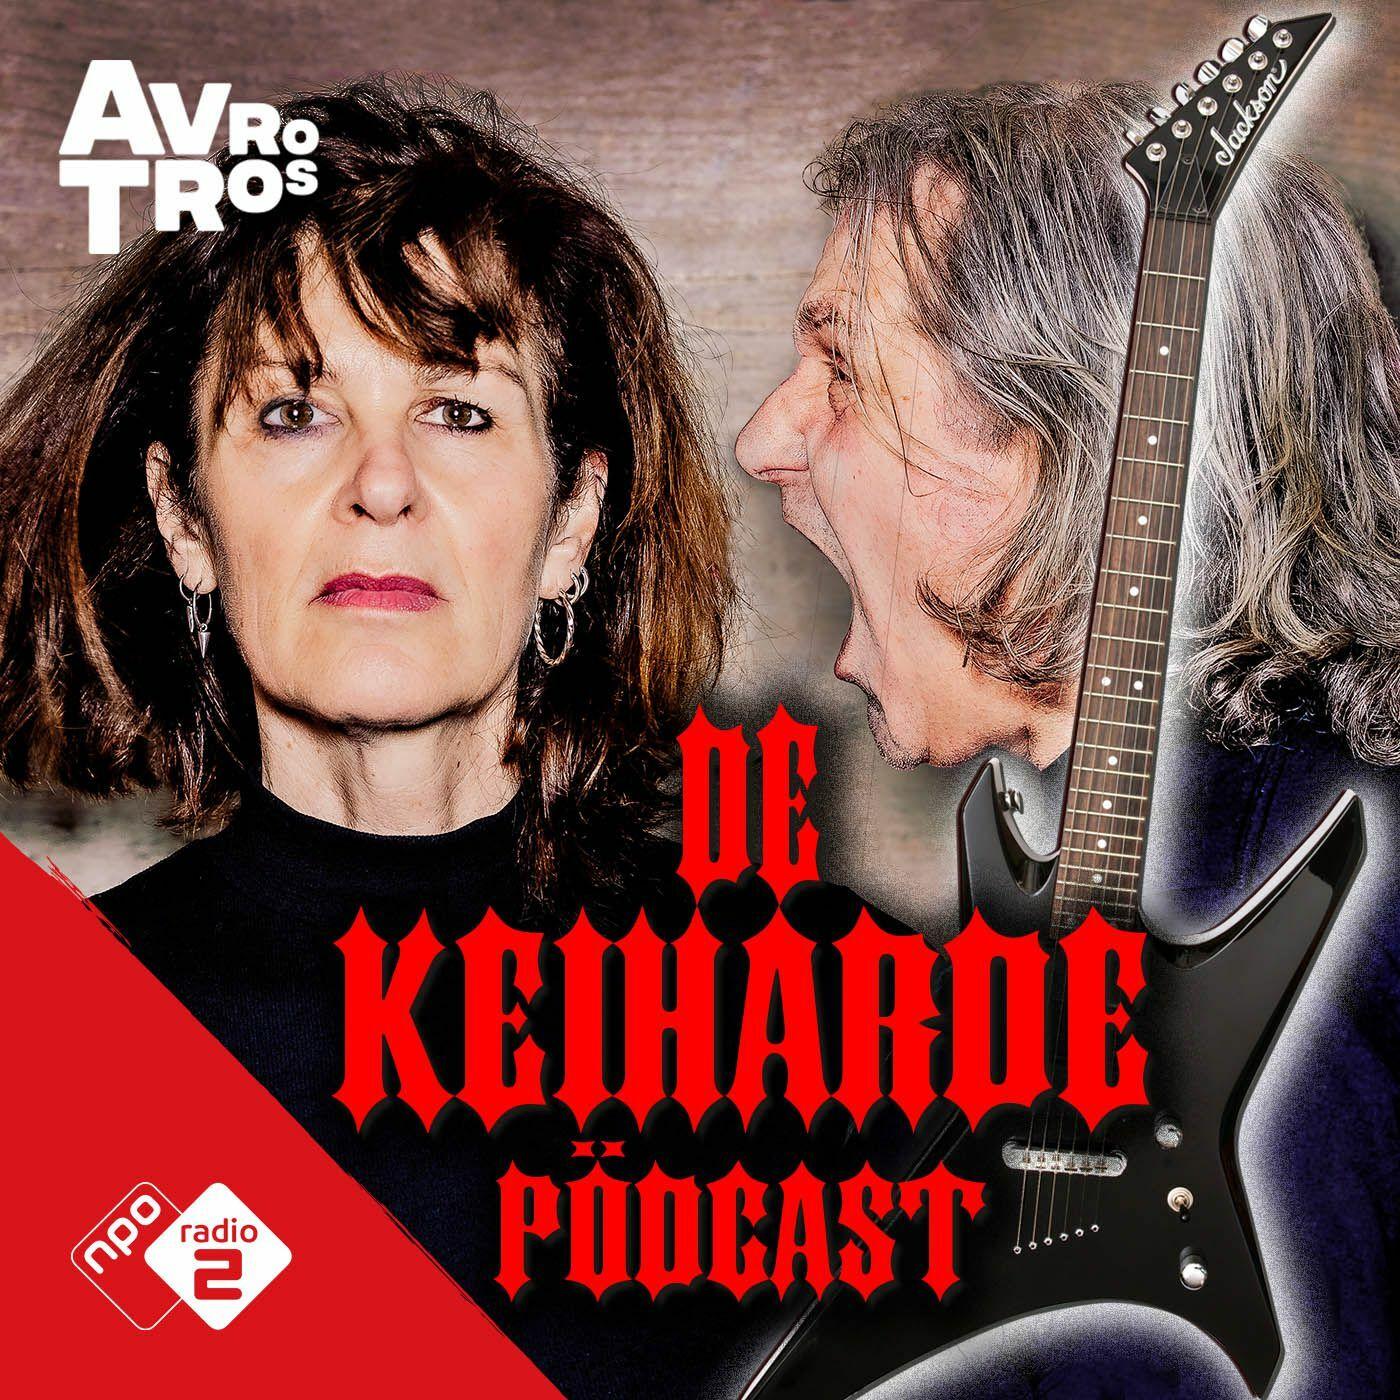 De Keiharde Podcast